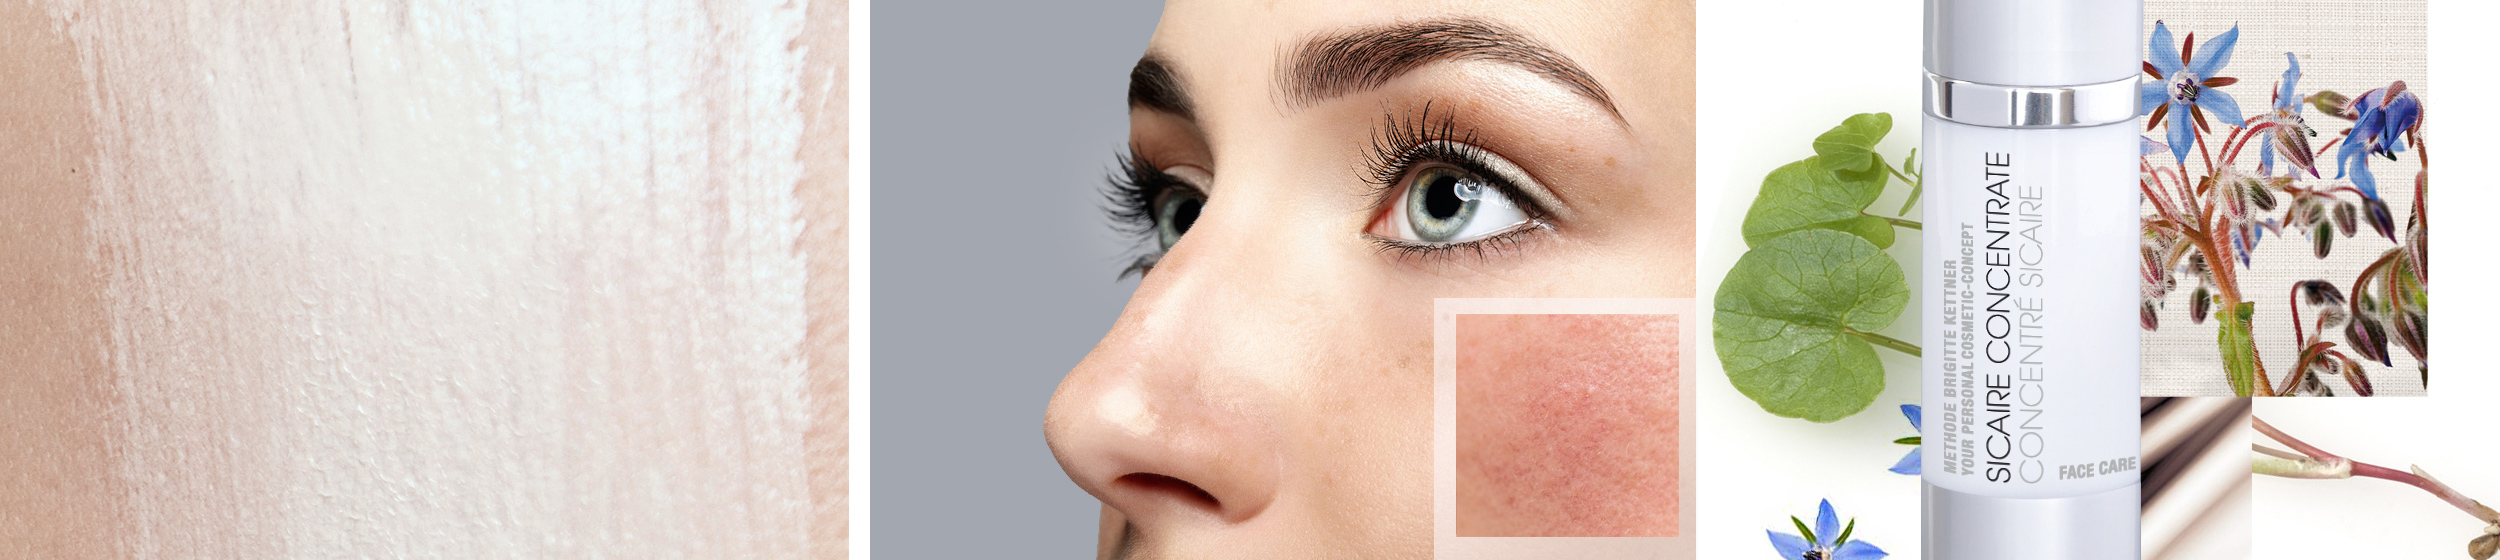 Sensible Haut, Tendenz Couperose/ Rötung